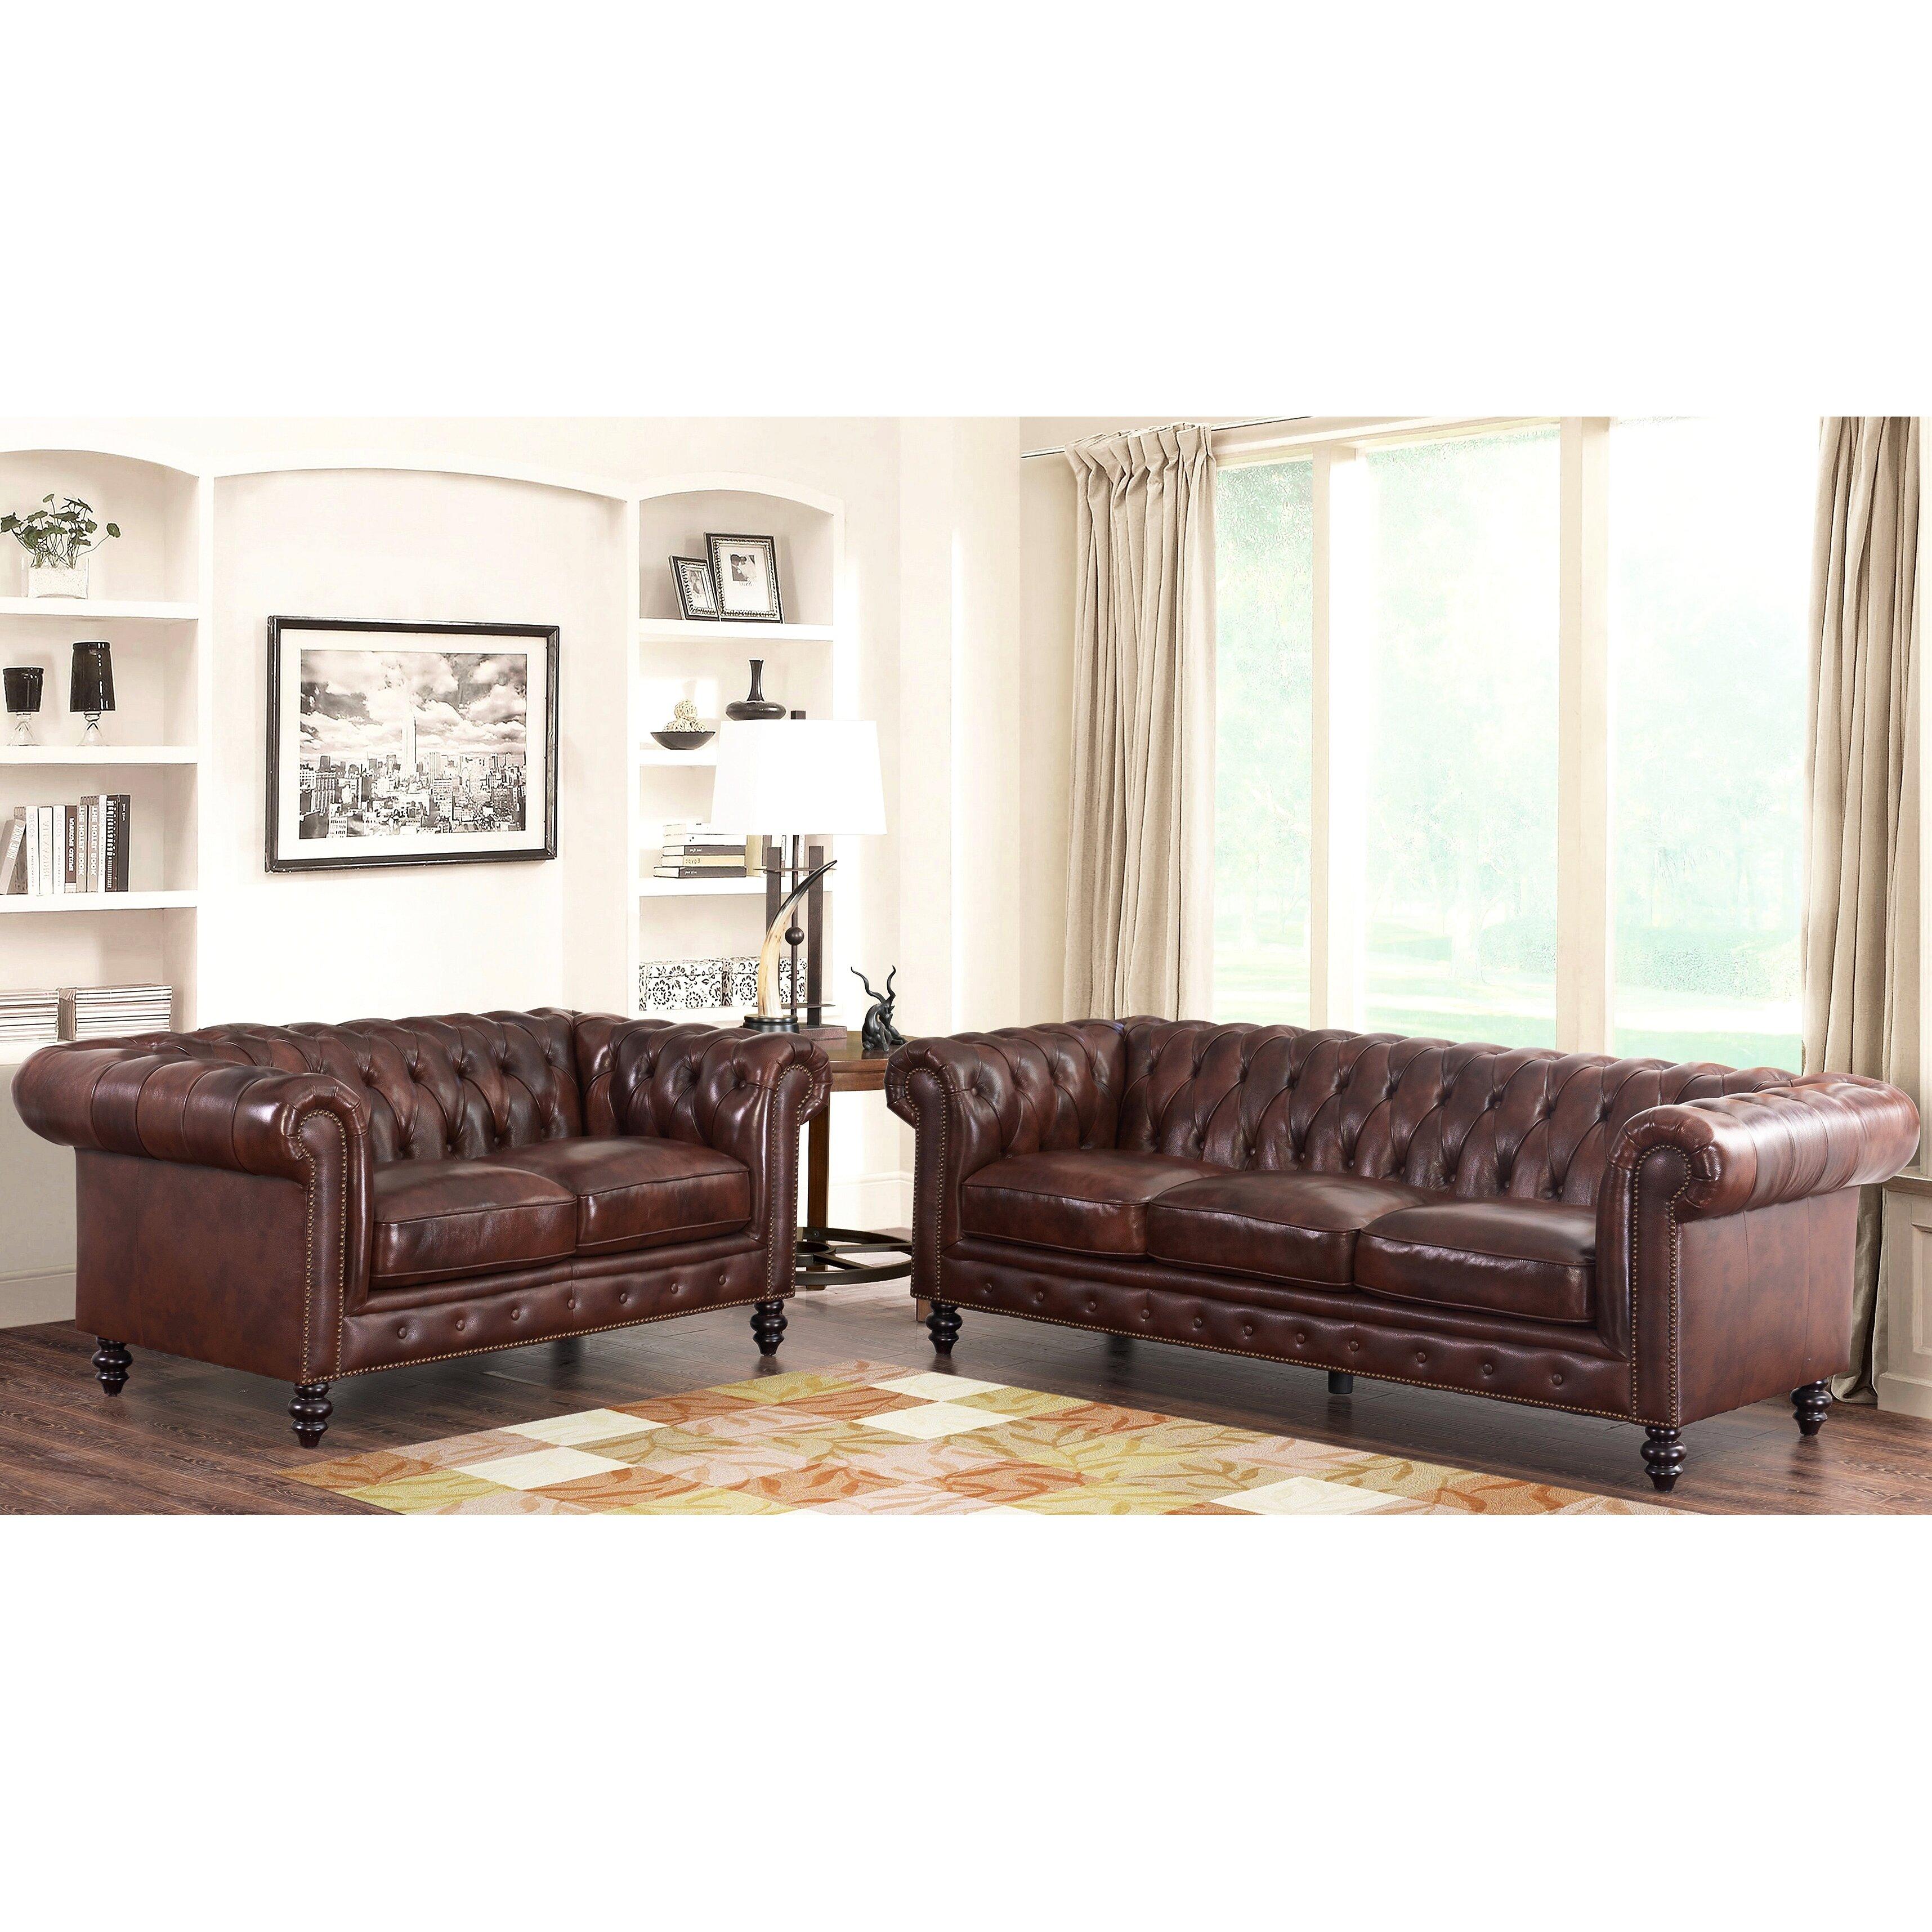 House Of Hampton Tunbridge Wells Top Grain Leather Sofa